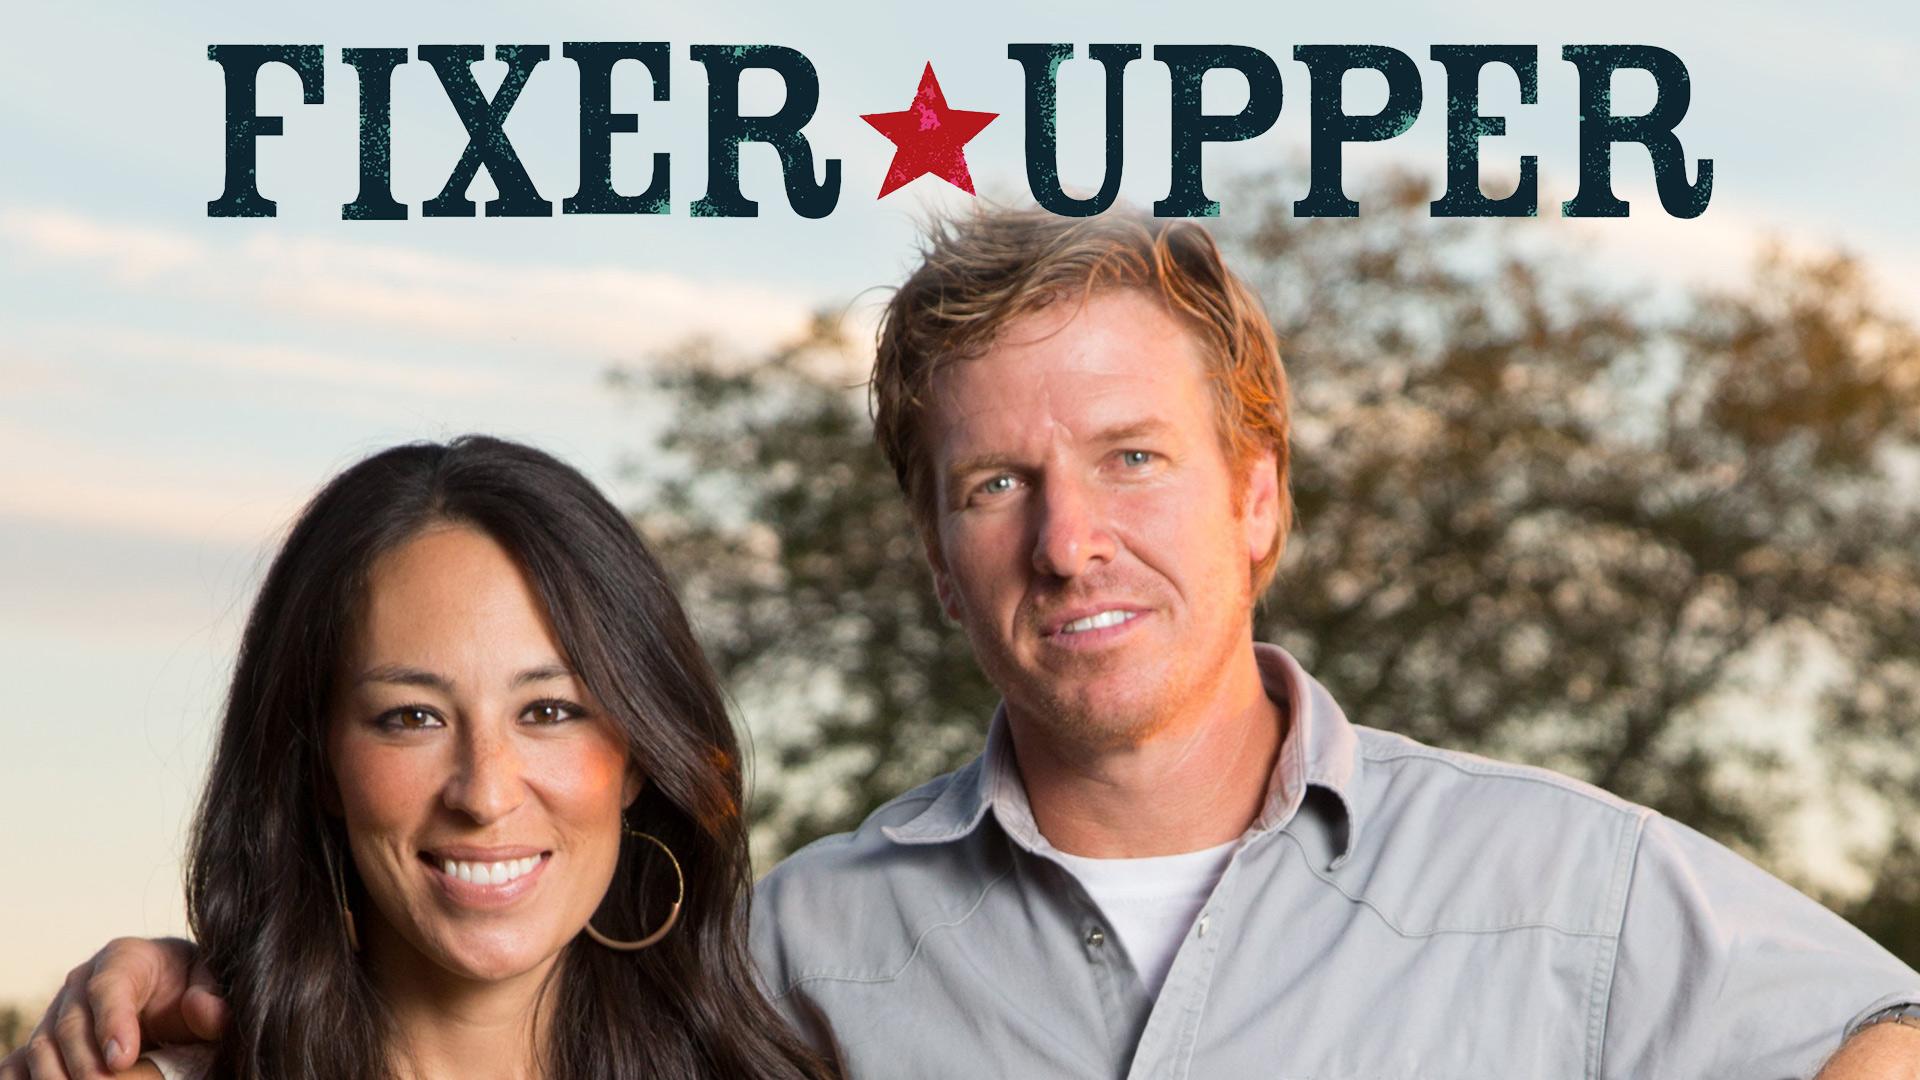 Fixer Upper Season 1